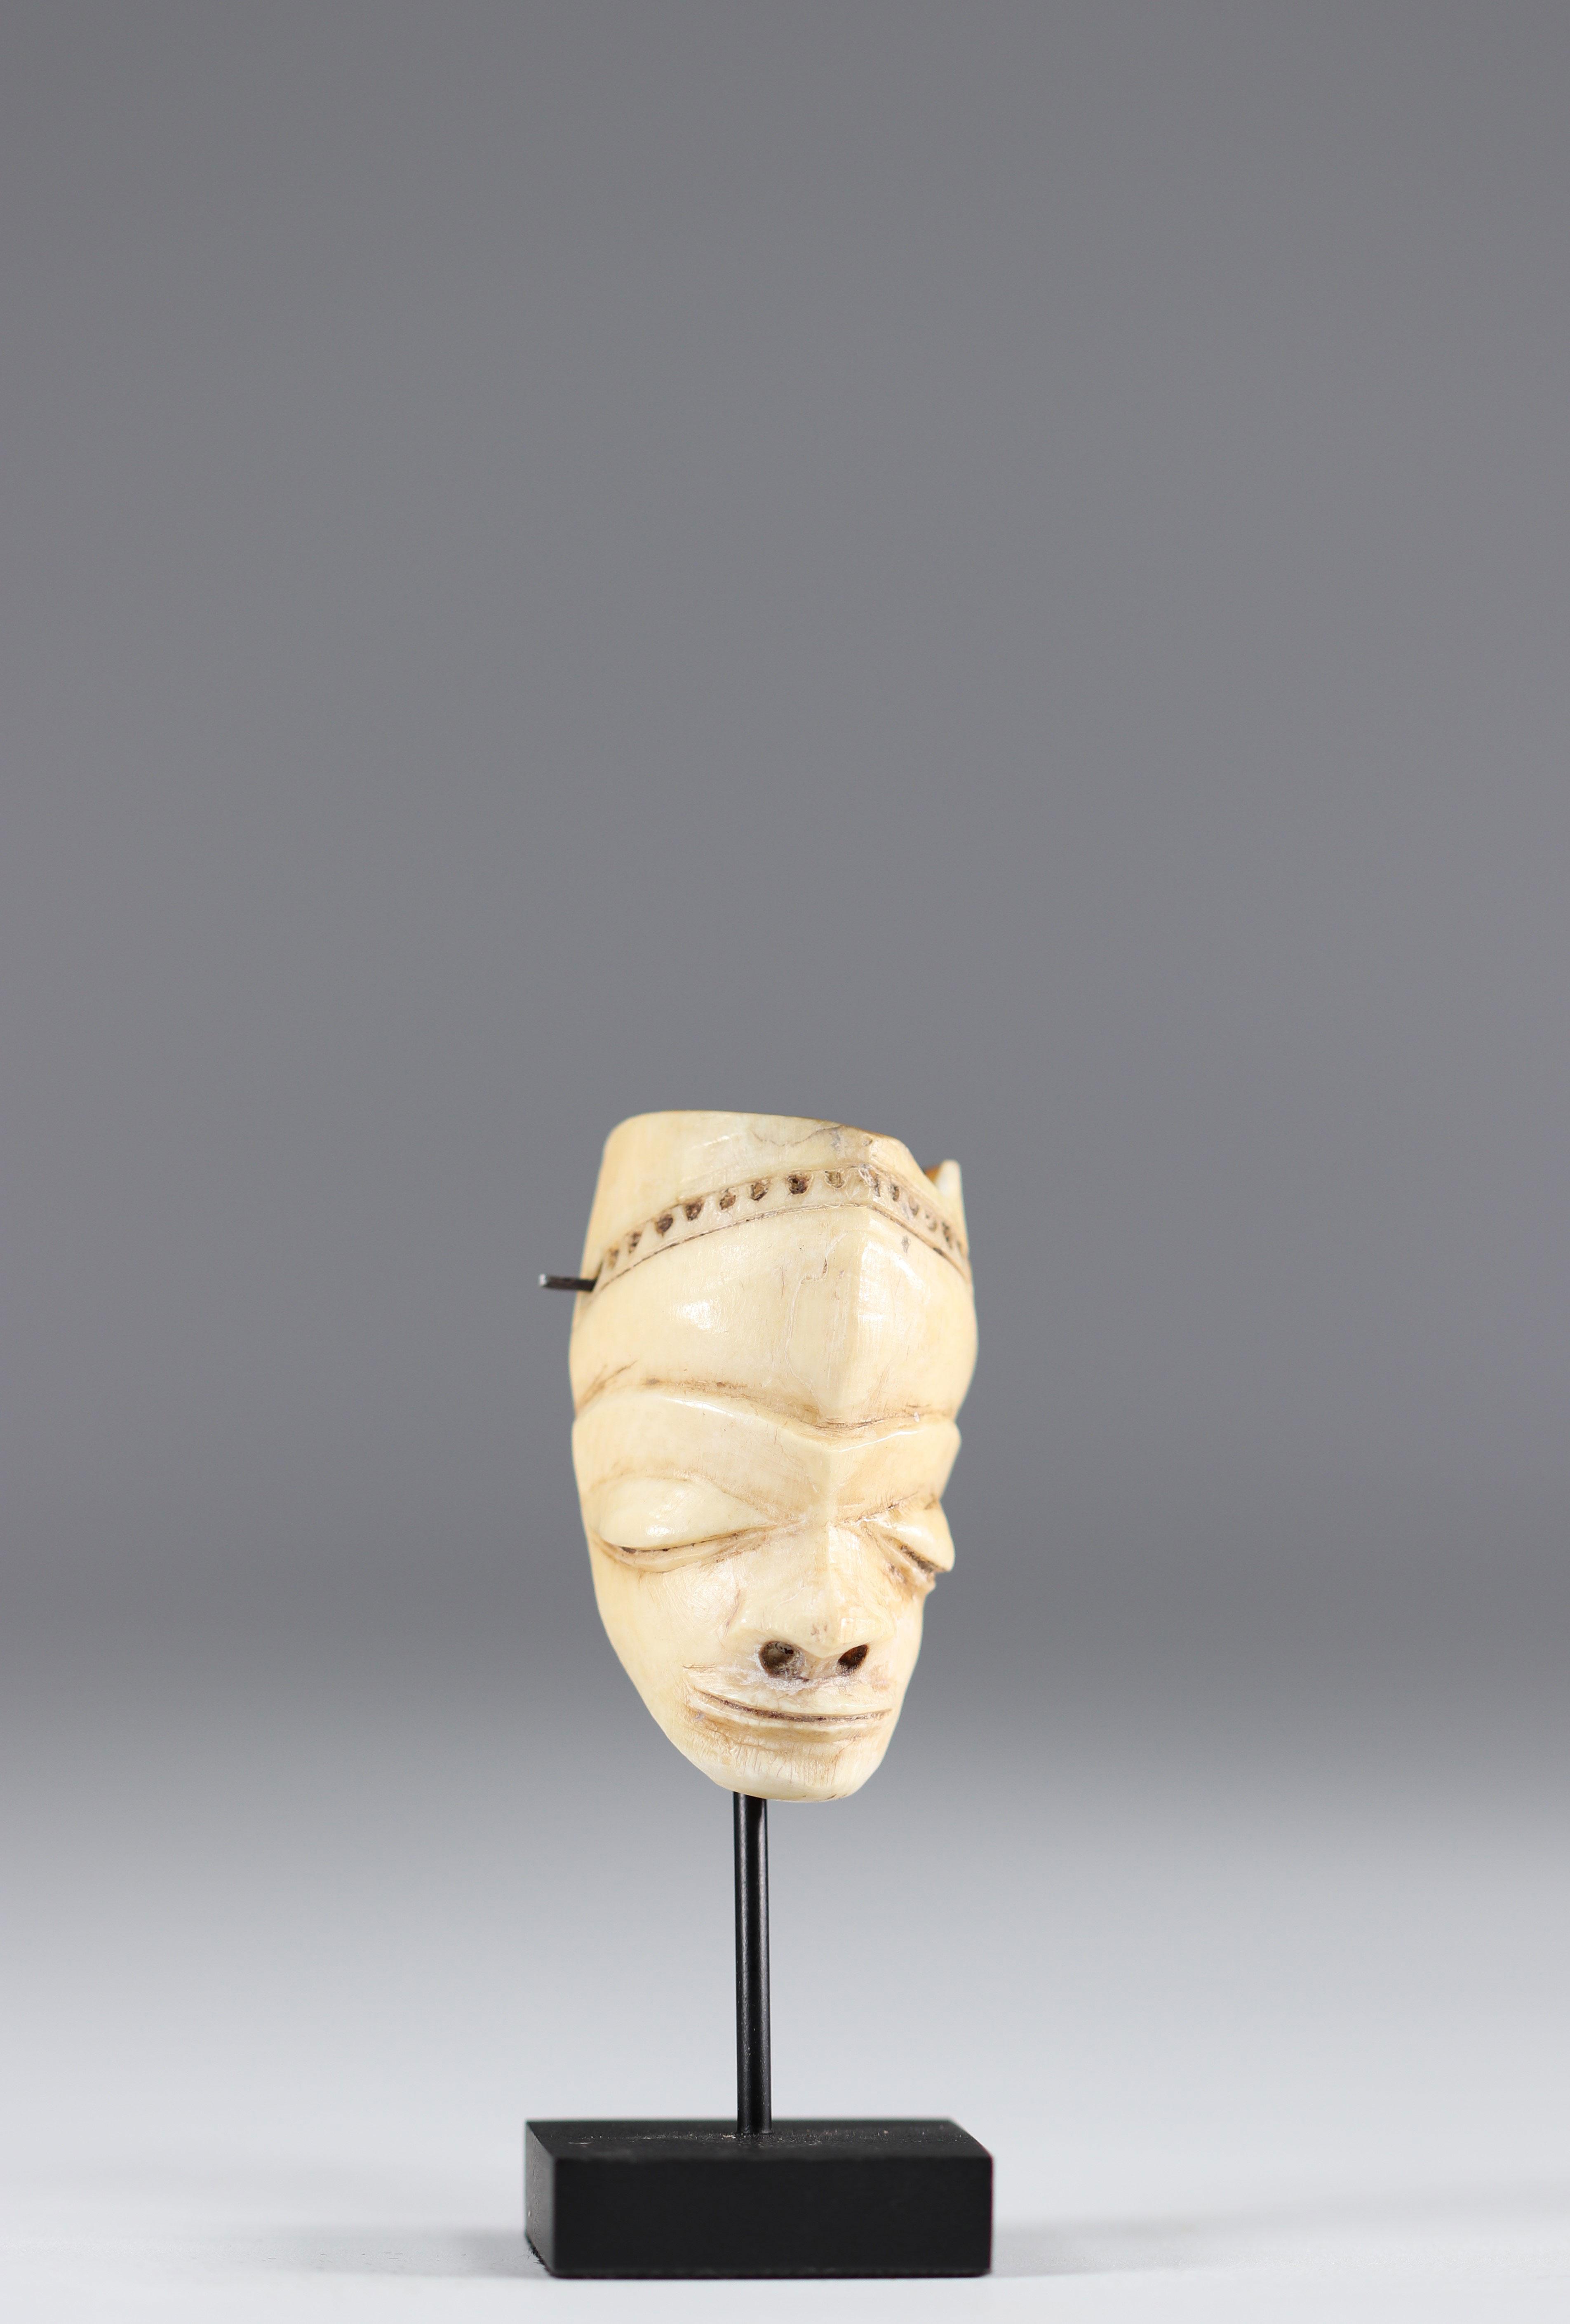 Pendant Pende ikhoko - private collar Belgium - mid 20th DRC - Africa - Image 2 of 4